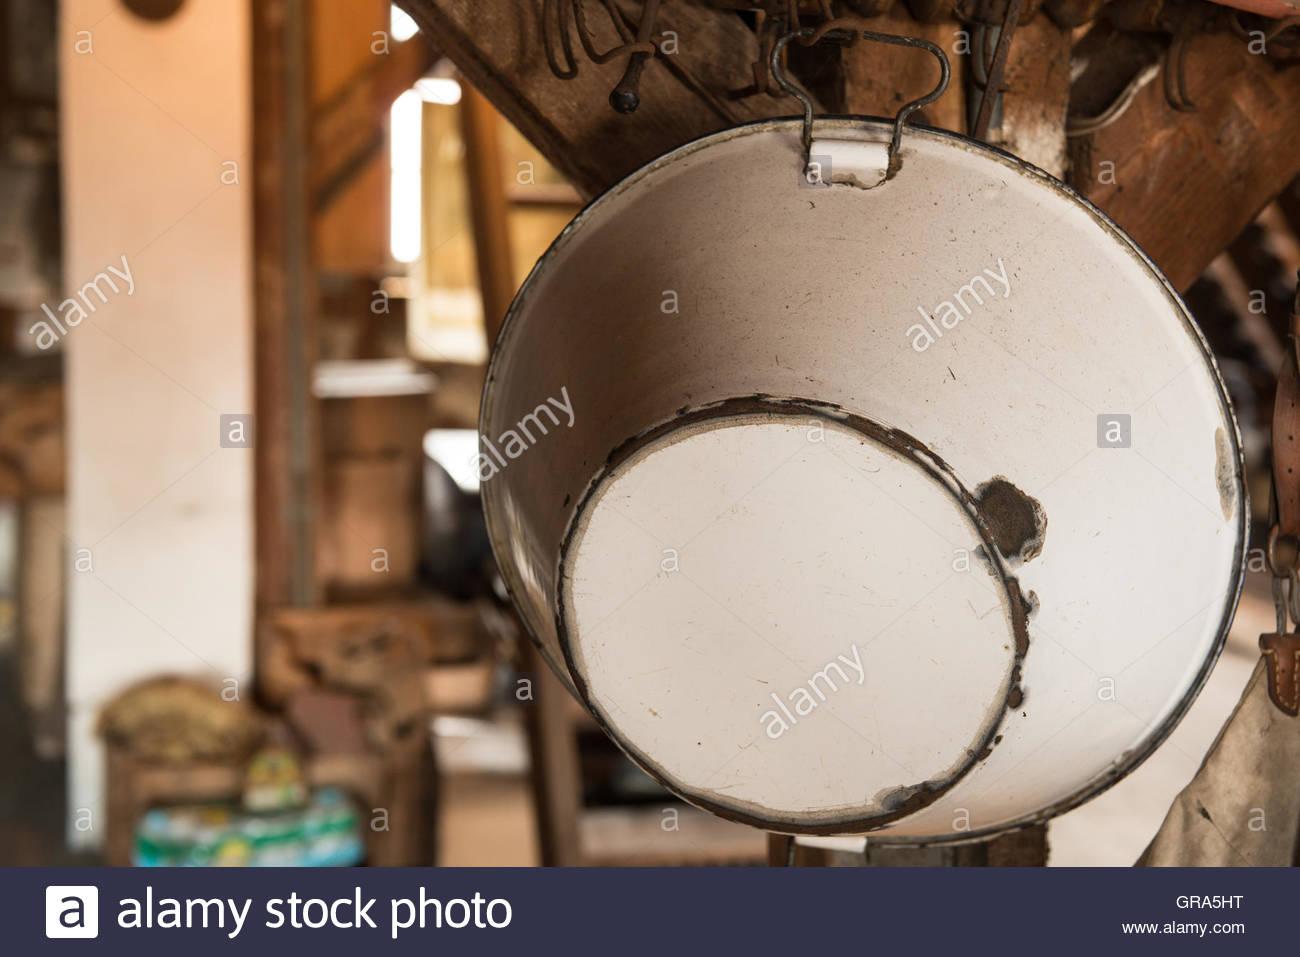 Enamel Pot On An Attic Stock Photo